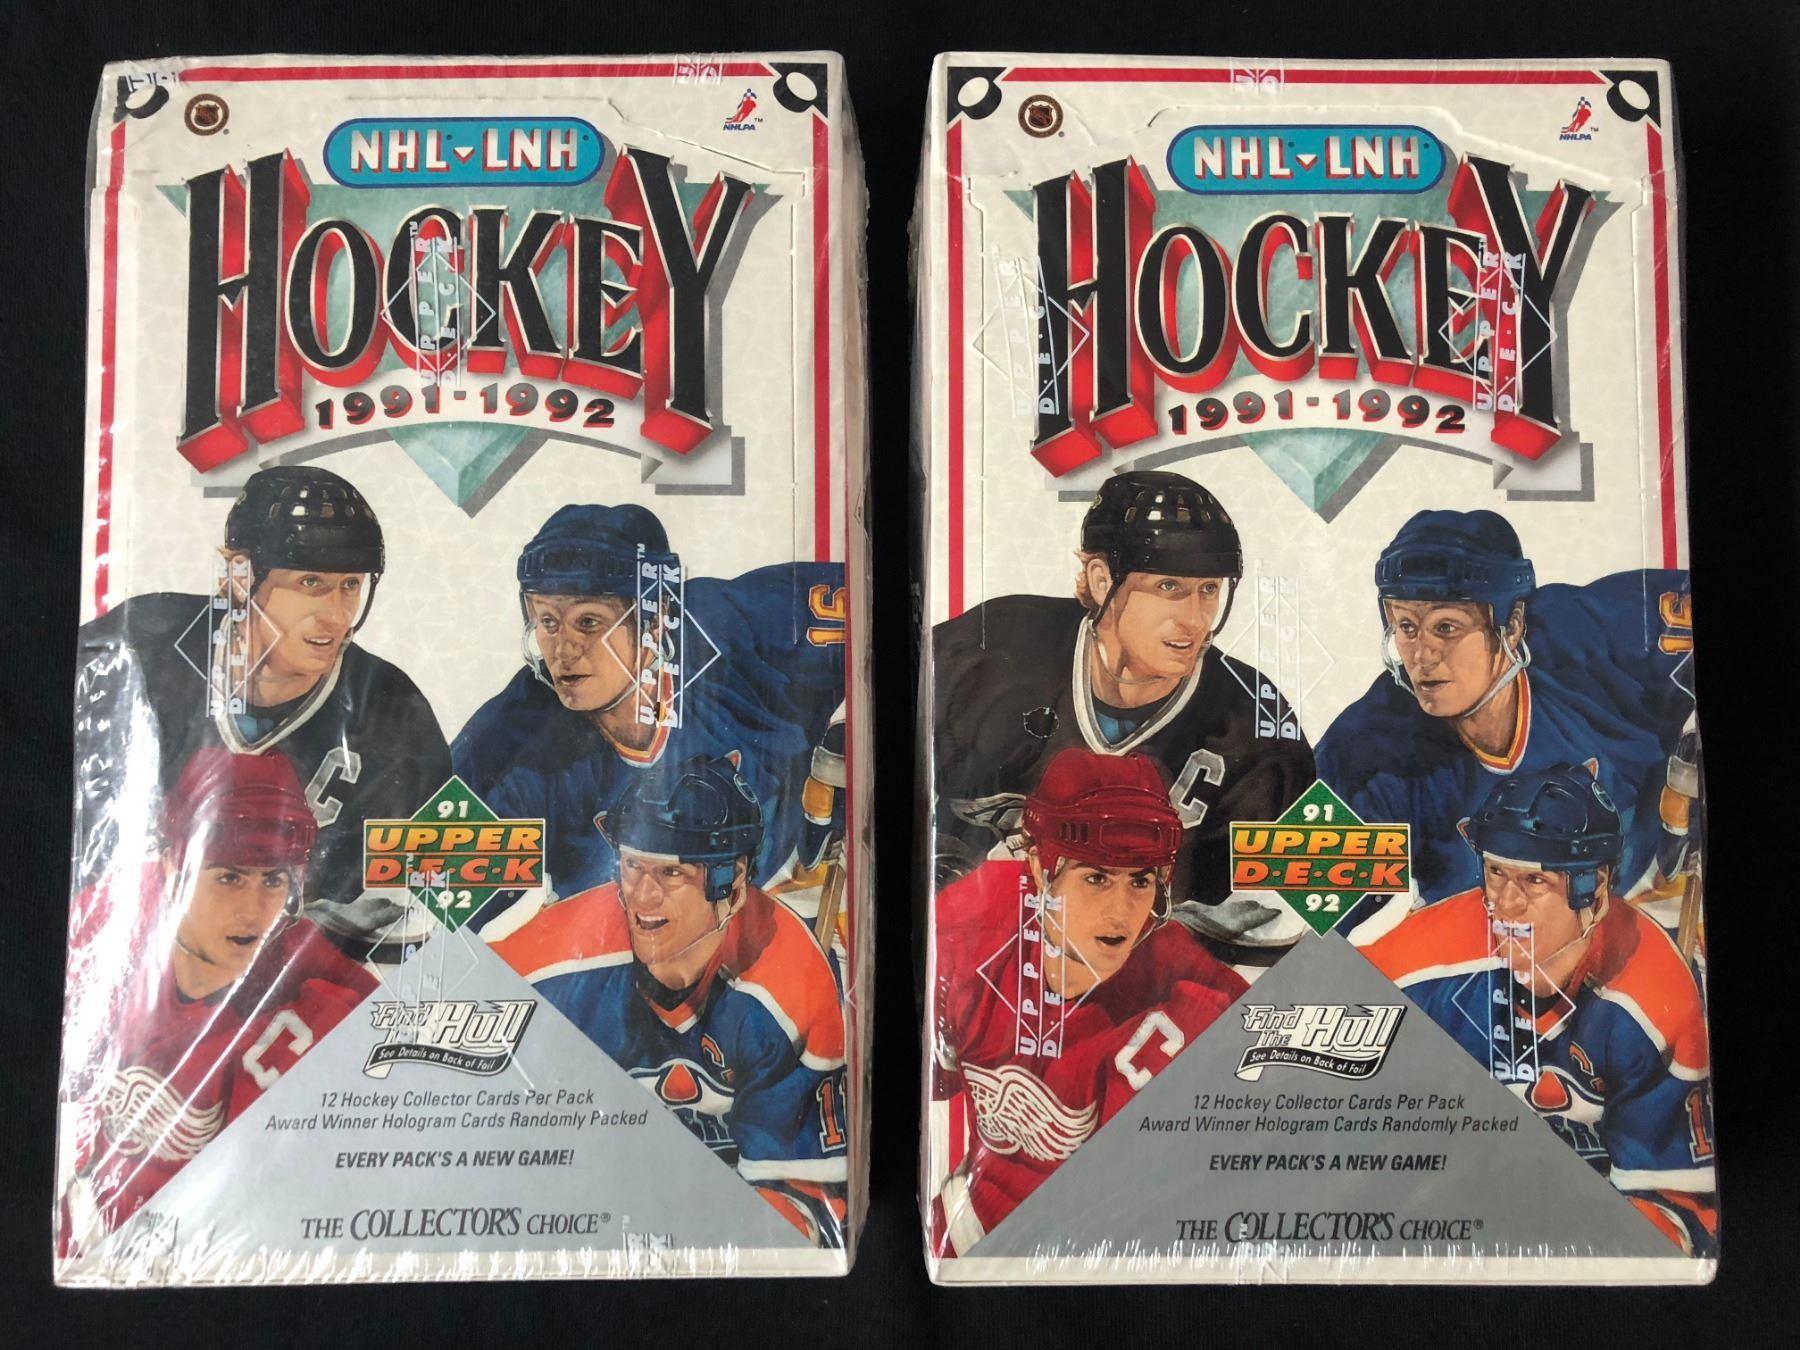 1991 92 Upper Deck Hockey Card Box Lot